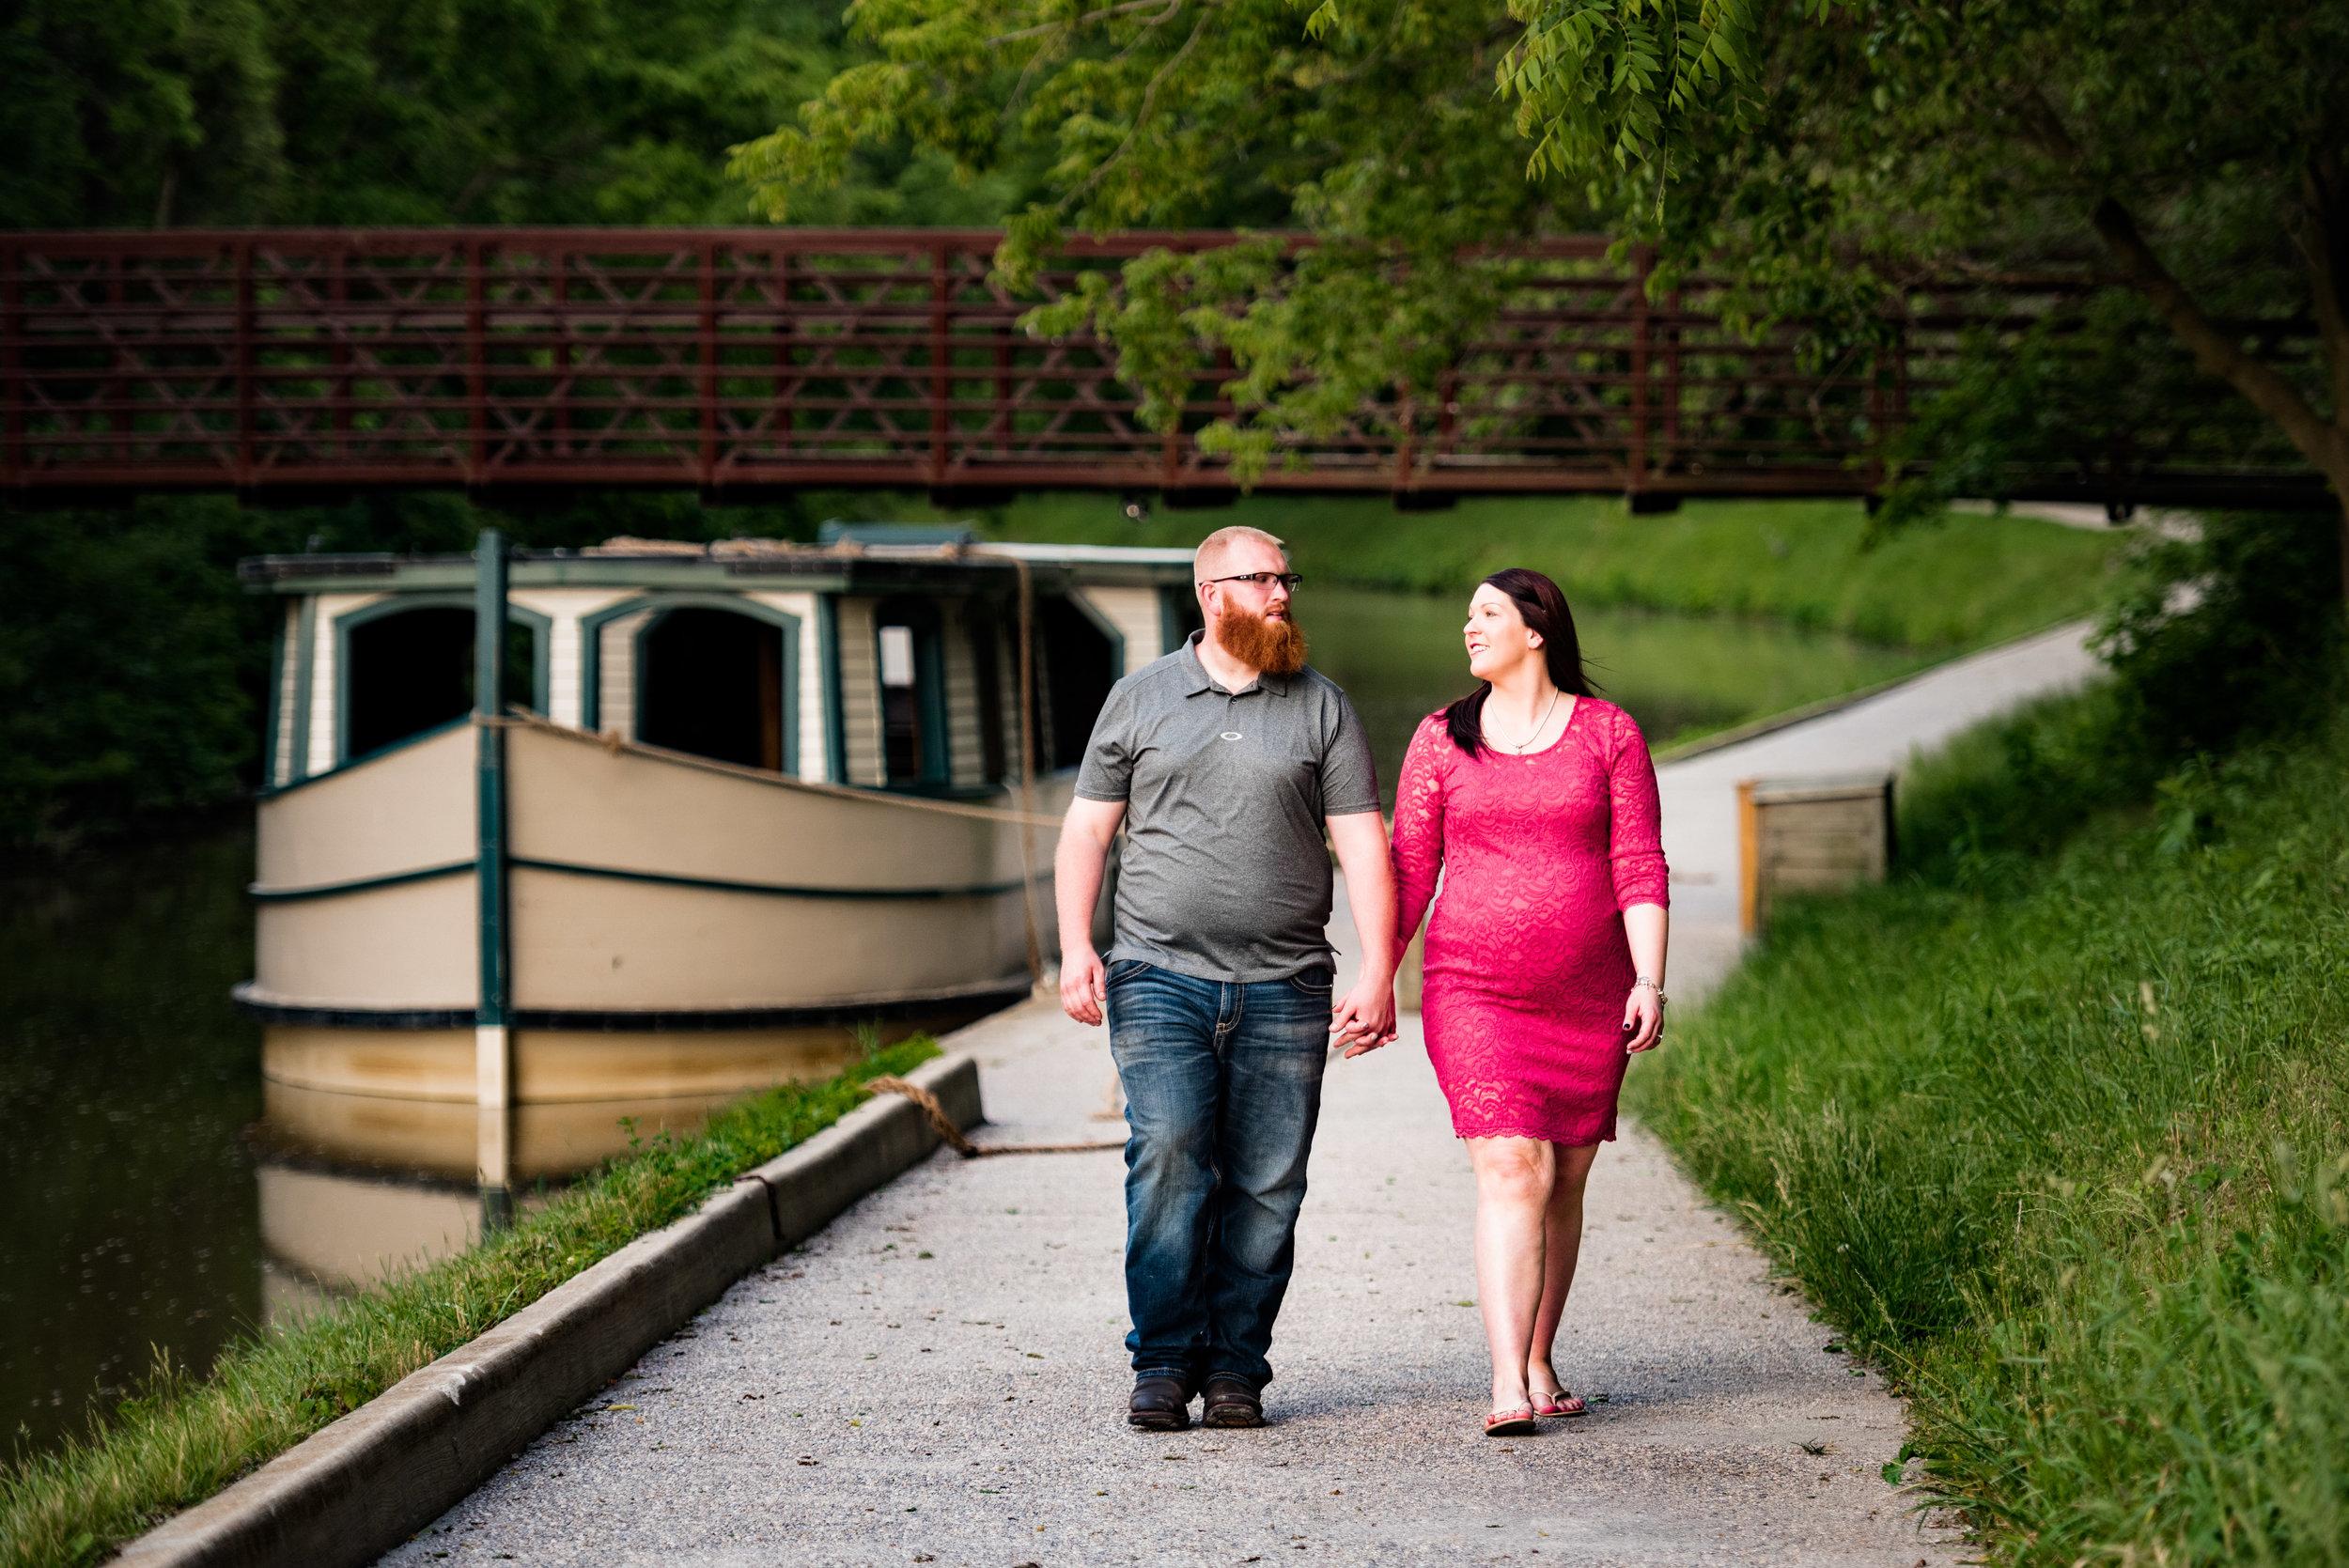 toledo ohio maternity photography-23.jpg